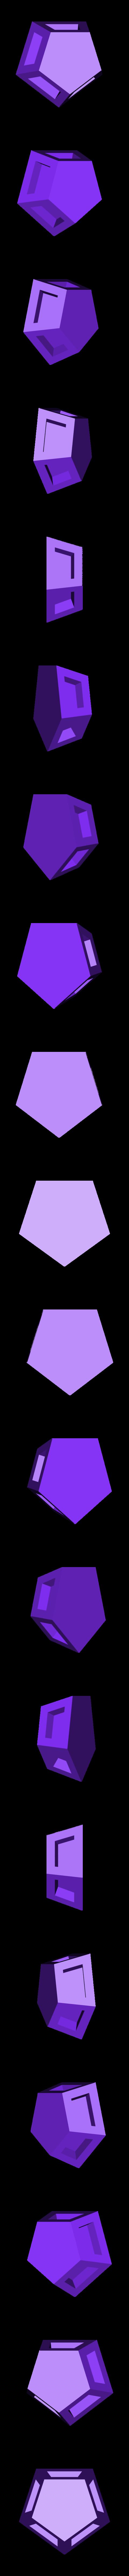 pentagon.stl Download free STL file Soccer ball (Truncated icosahedron) assembly • 3D printer object, mattias_selin